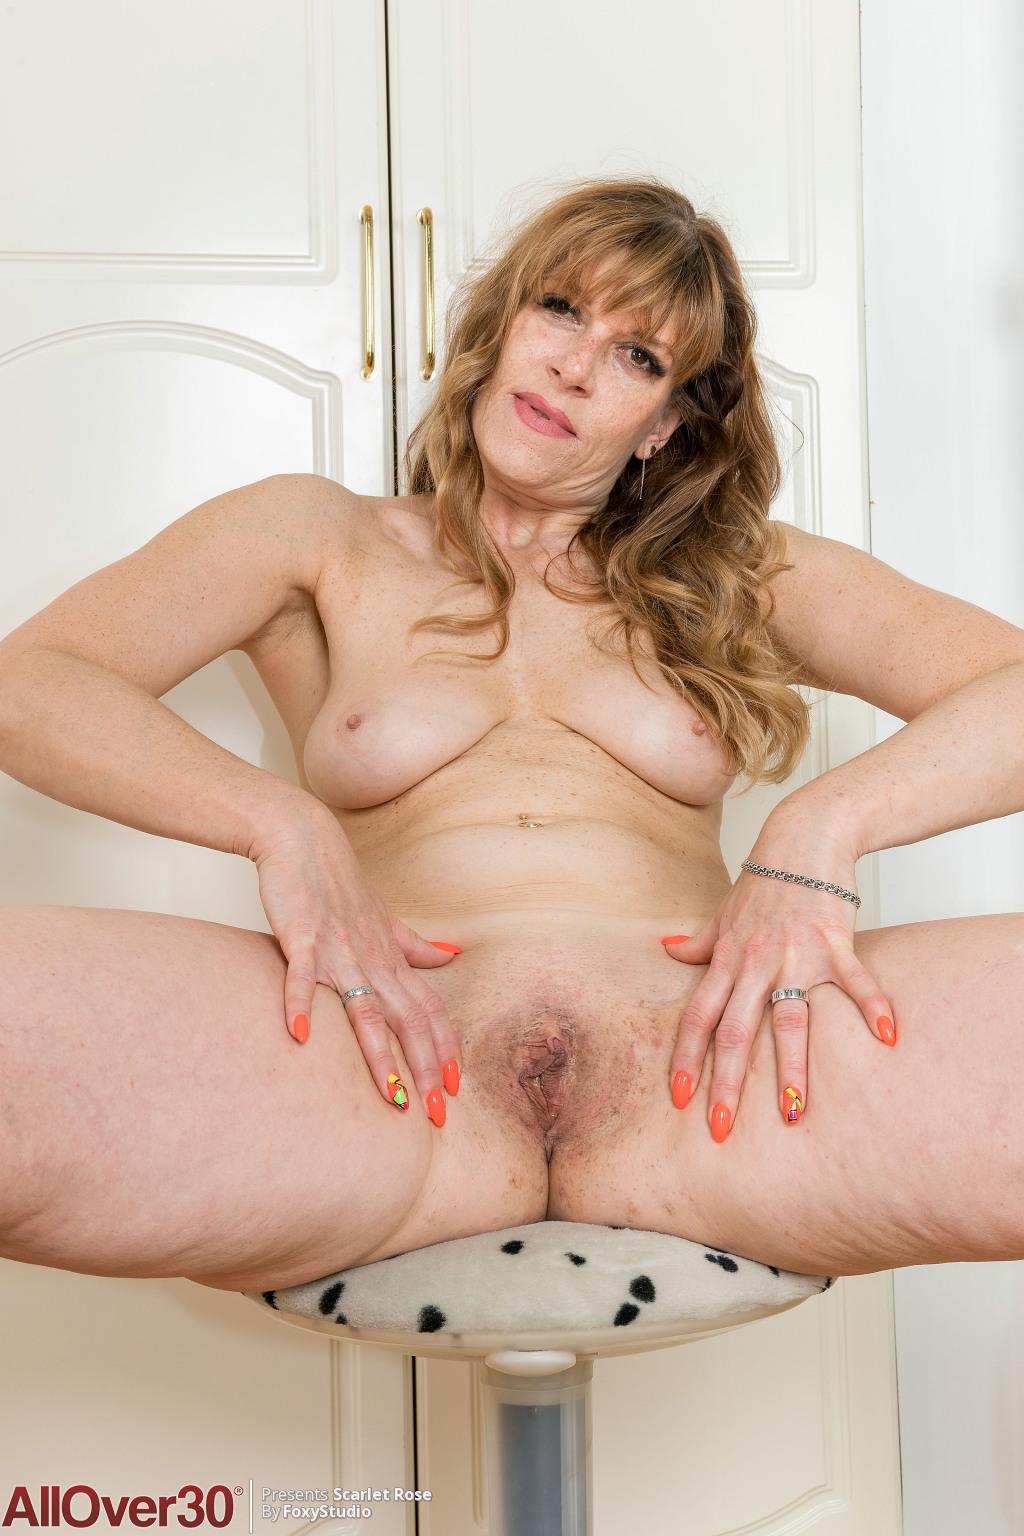 tampa sex